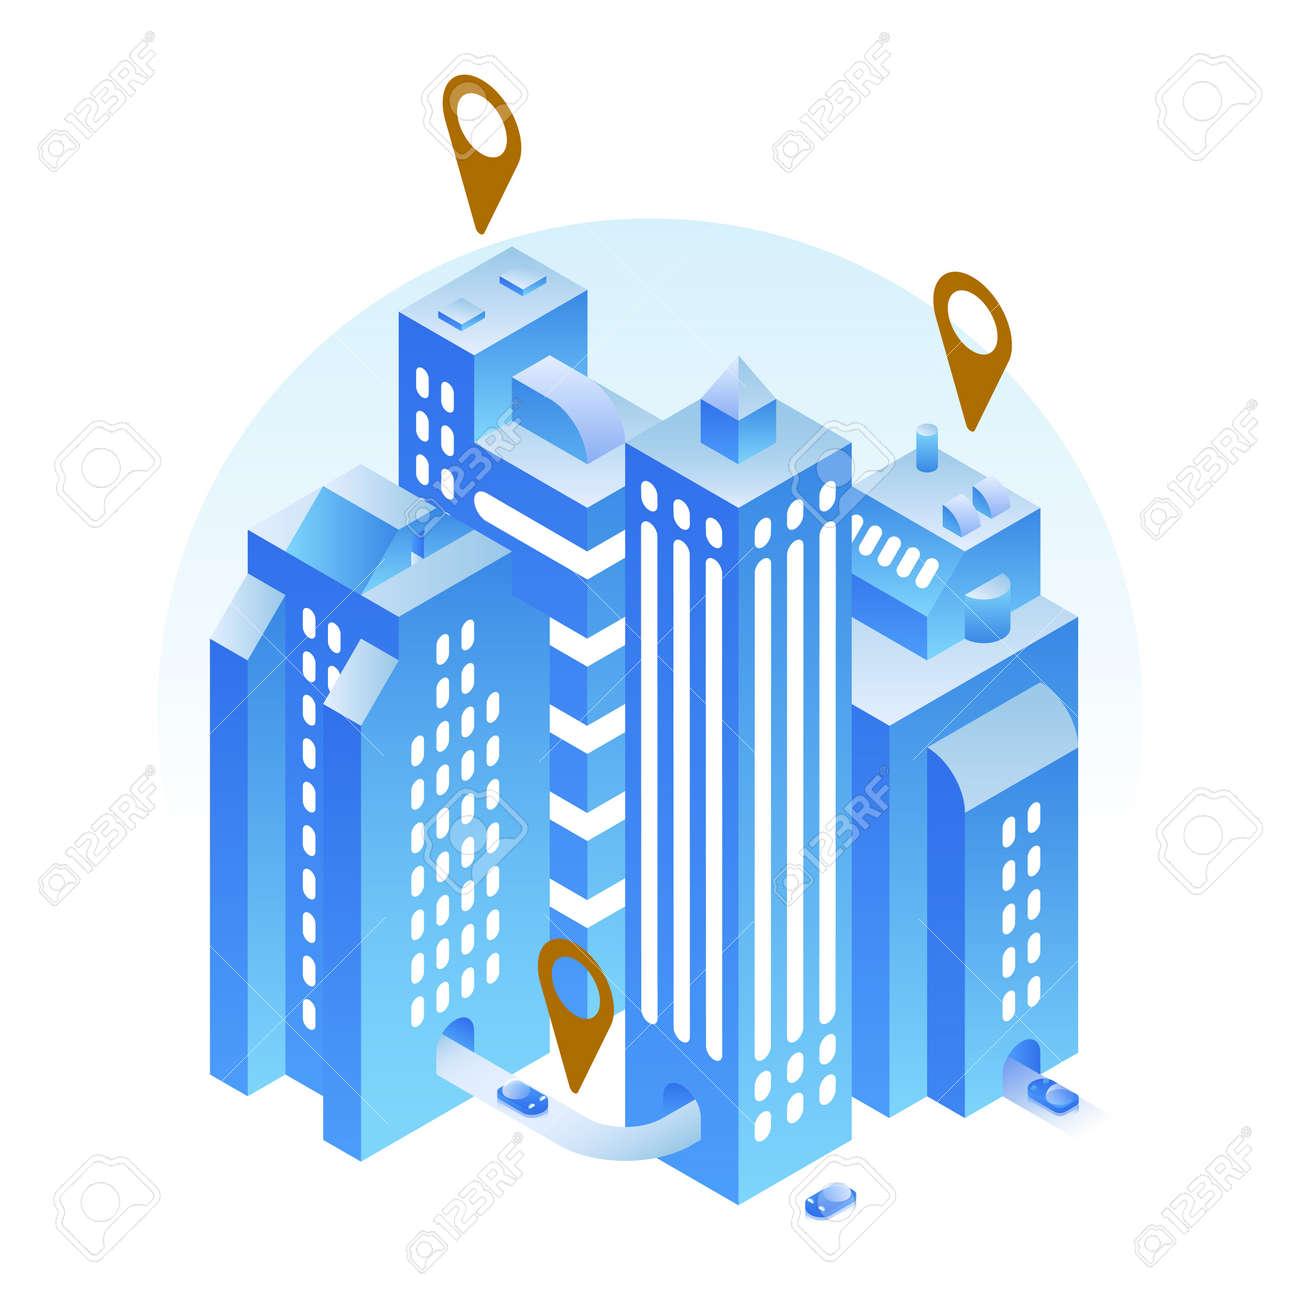 Isometric Modern City Location Illustration - 171310283